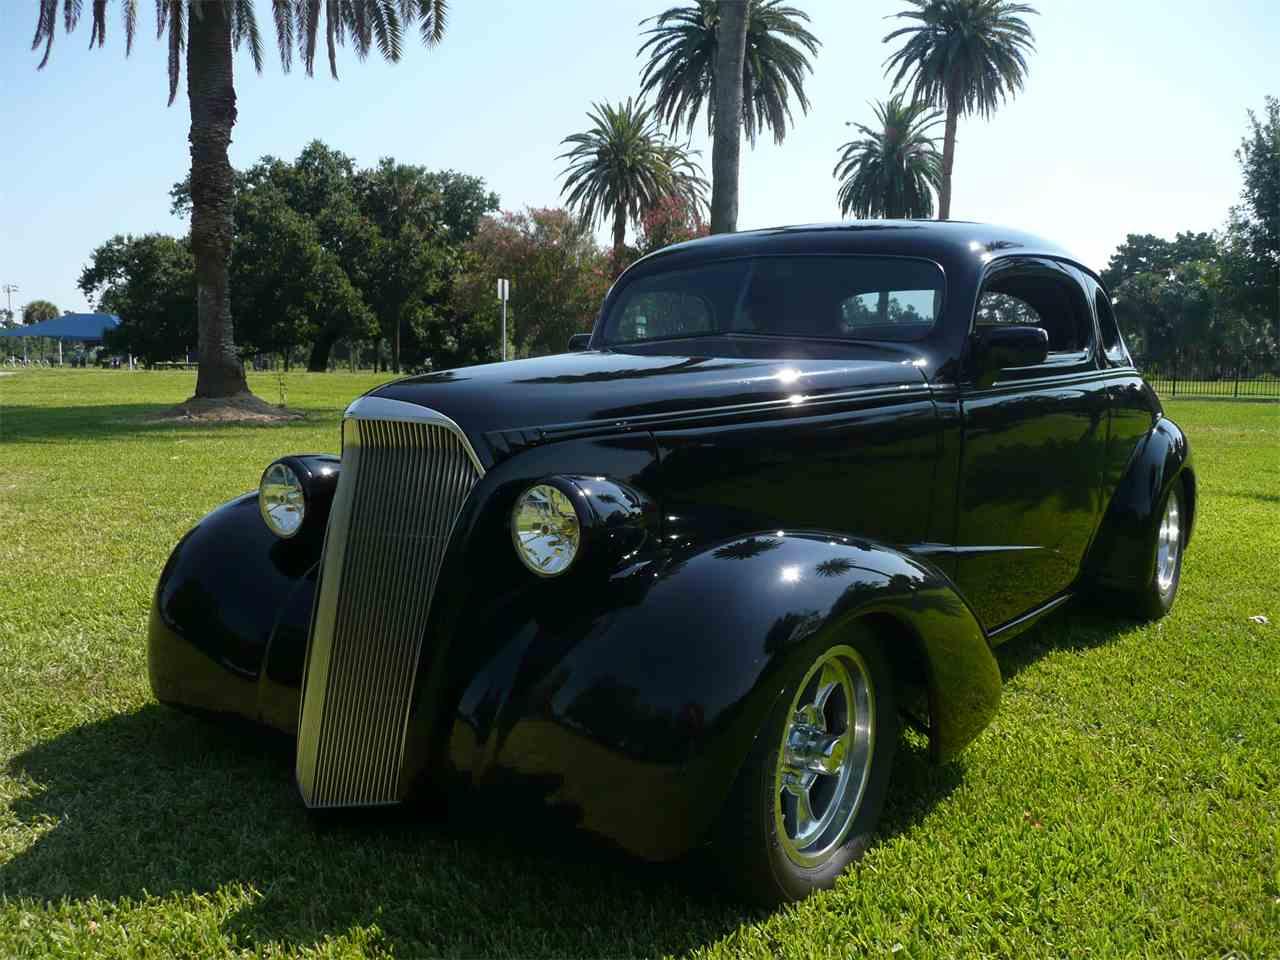 1937 Chevrolet Coupe for Sale | ClassicCars.com | CC-709967